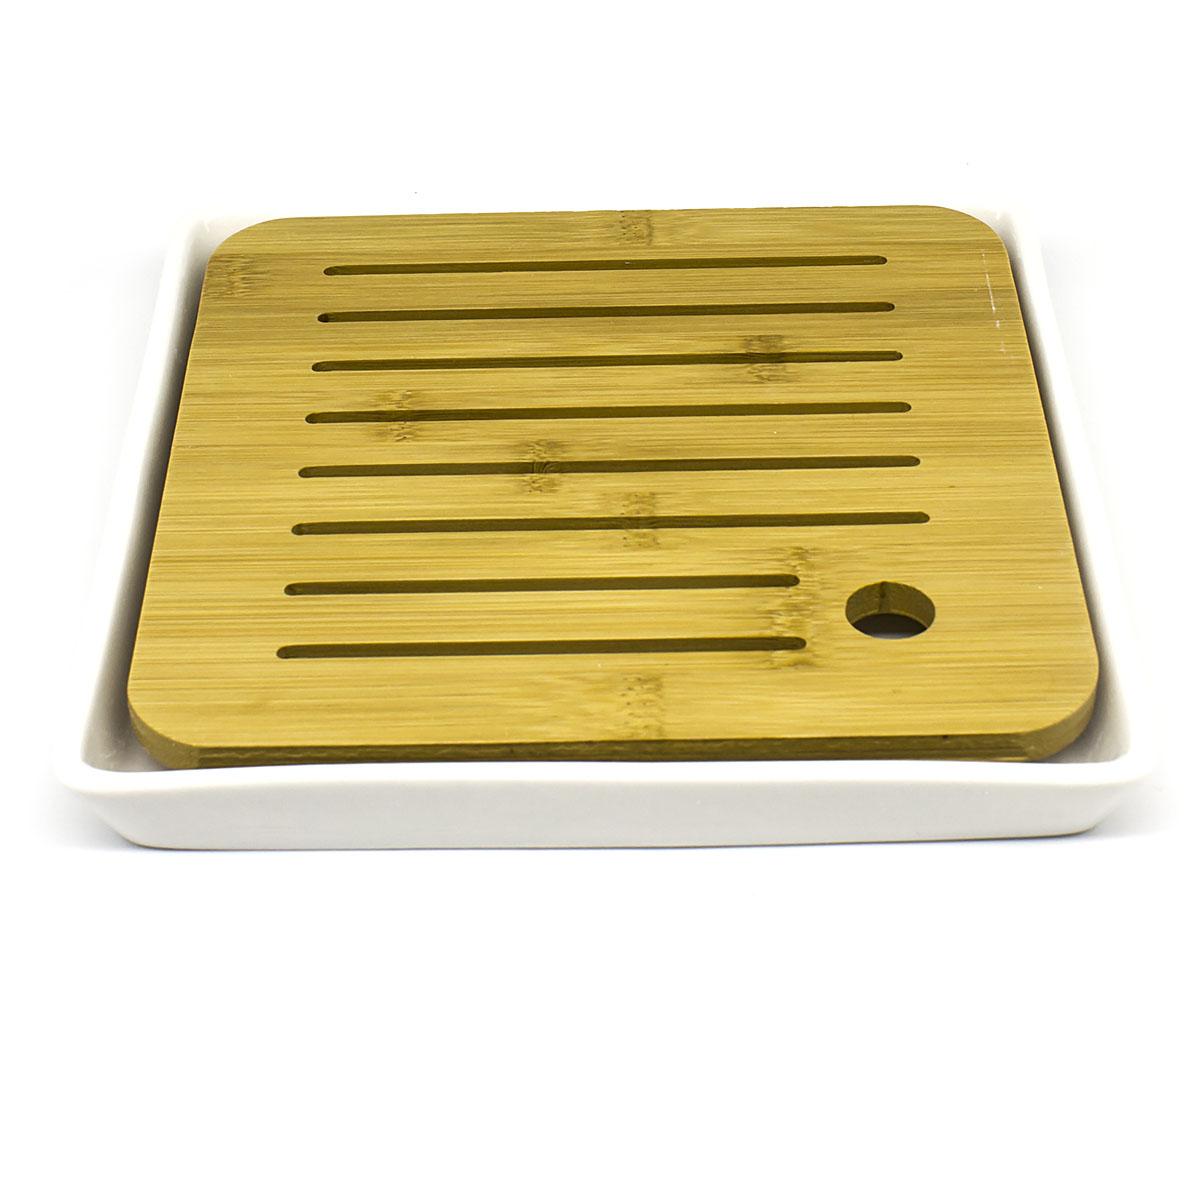 Чабань квадратная (бамбук и фарфор), 21х21х3 см